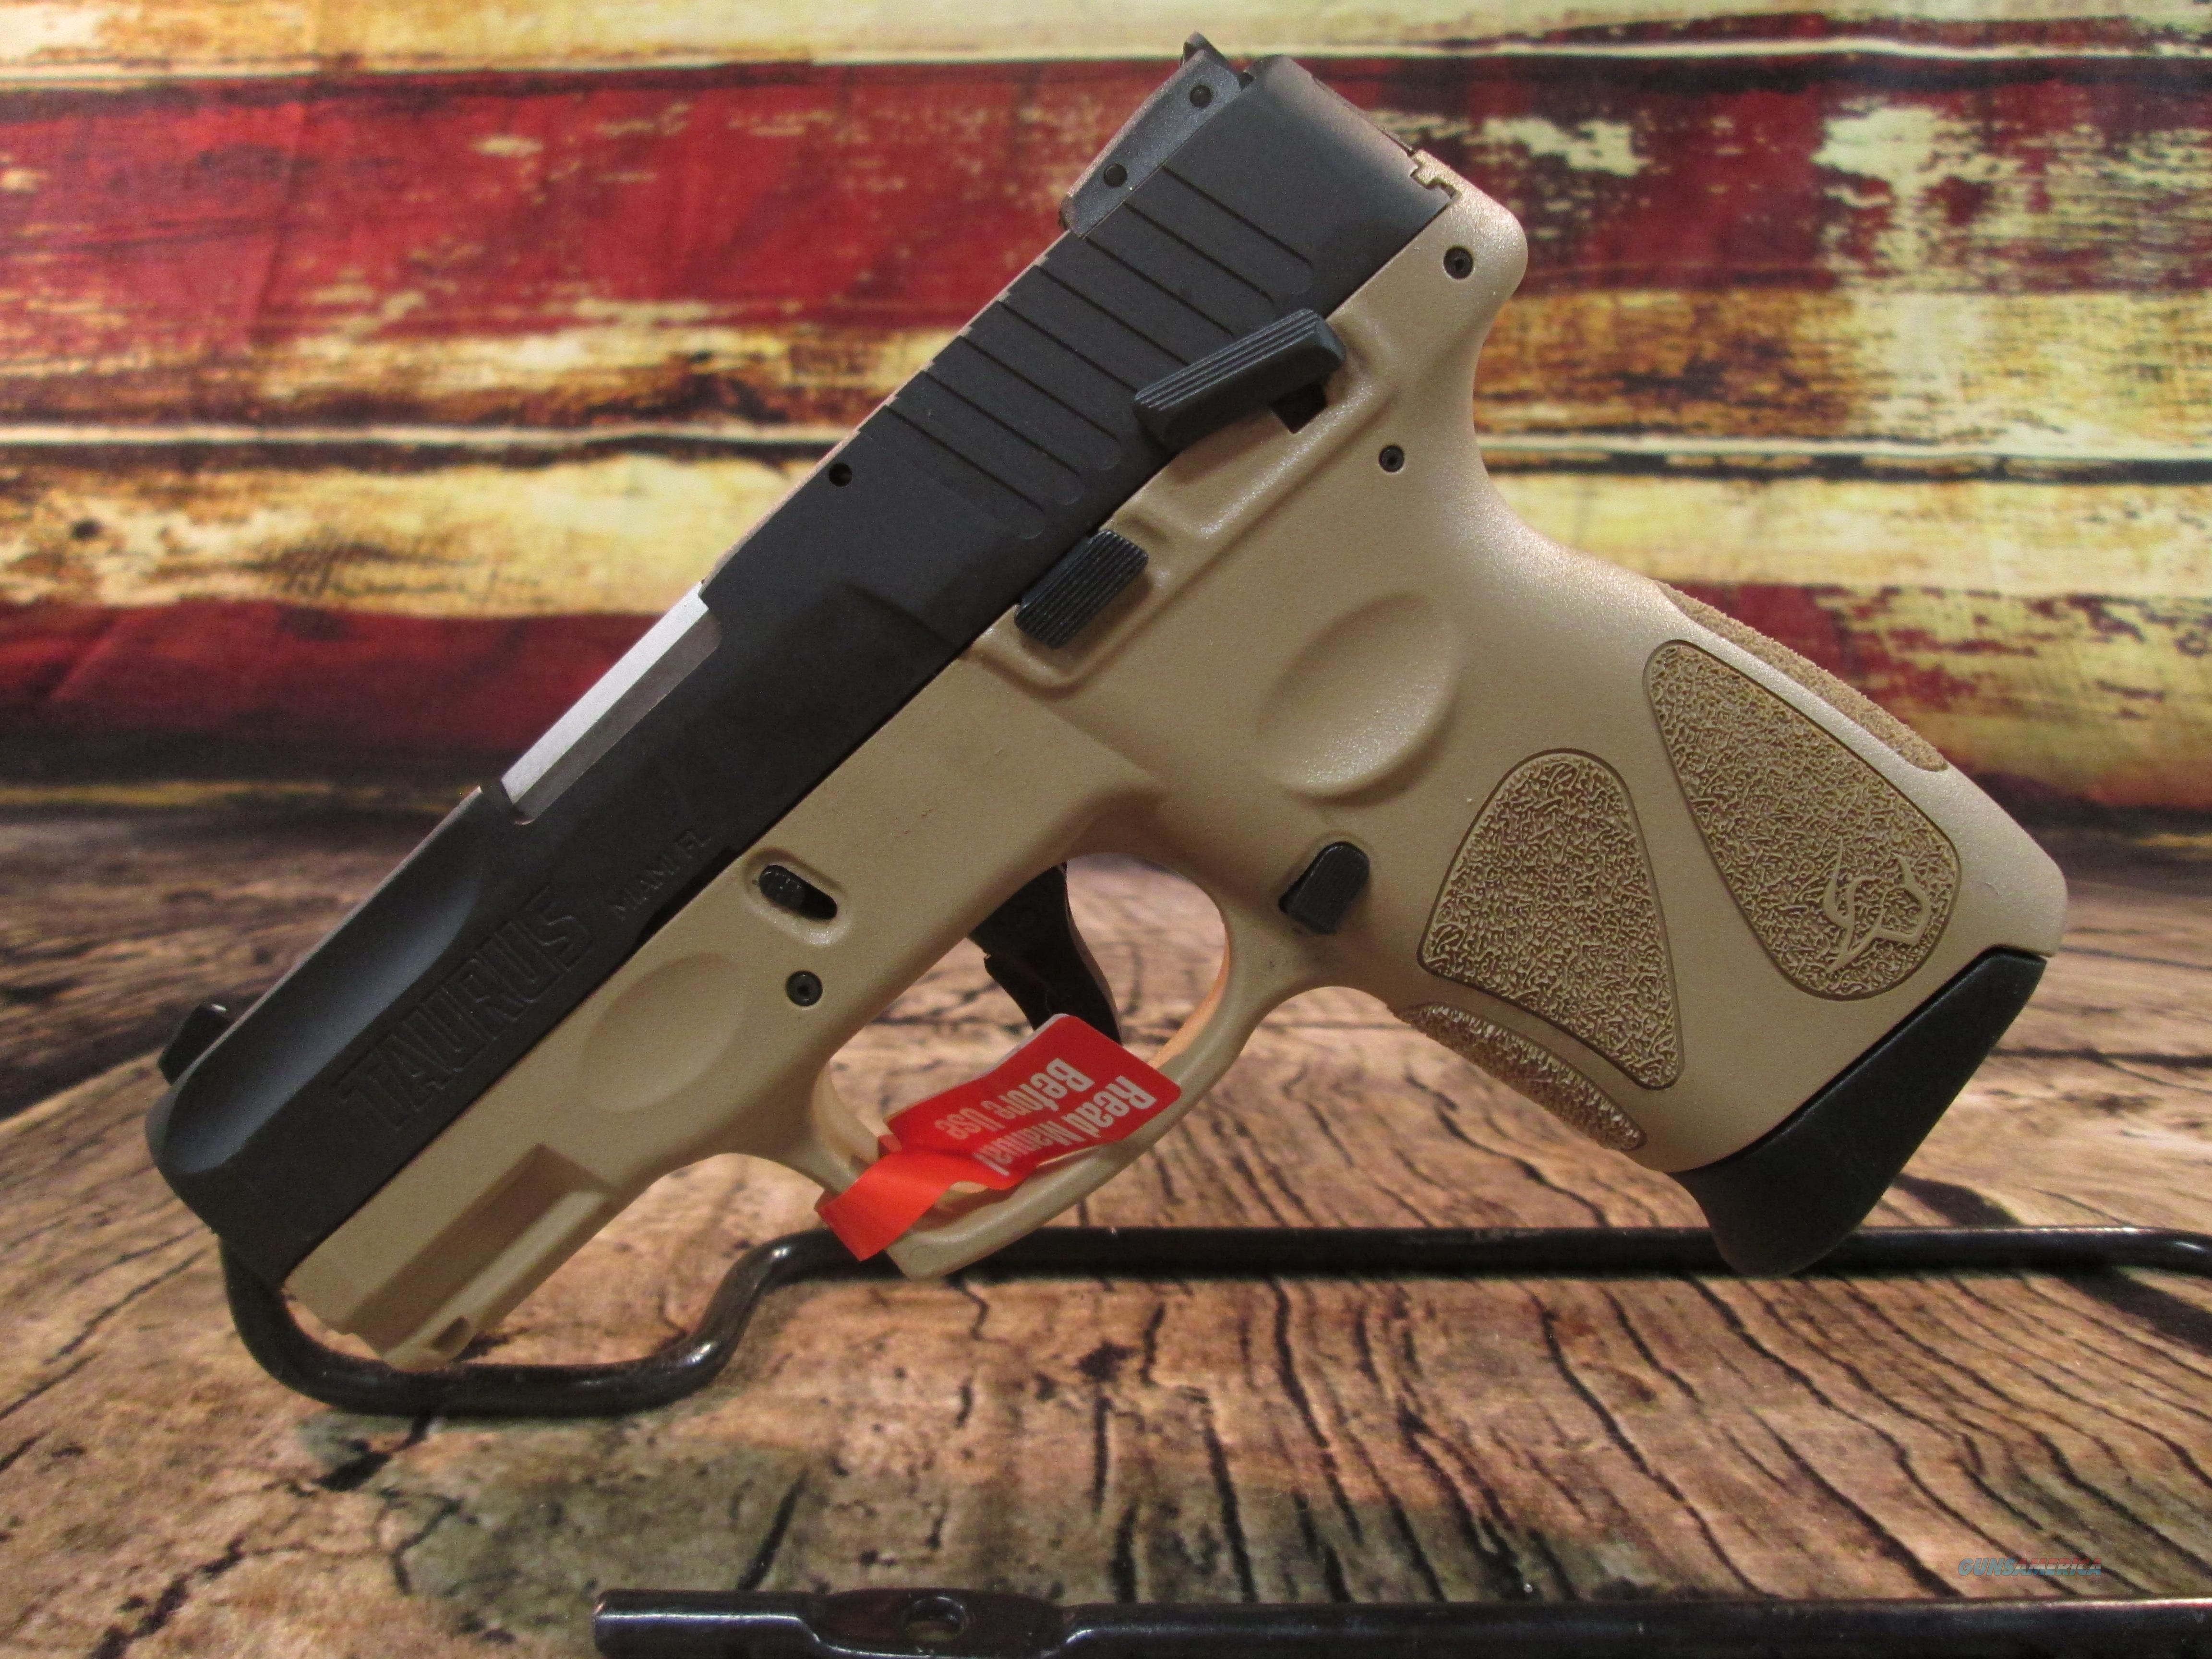 TAURUS G2C  .9MM NEW (1-G2C931-12T)    Guns > Pistols > Taurus Pistols > Semi Auto Pistols > Polymer Frame